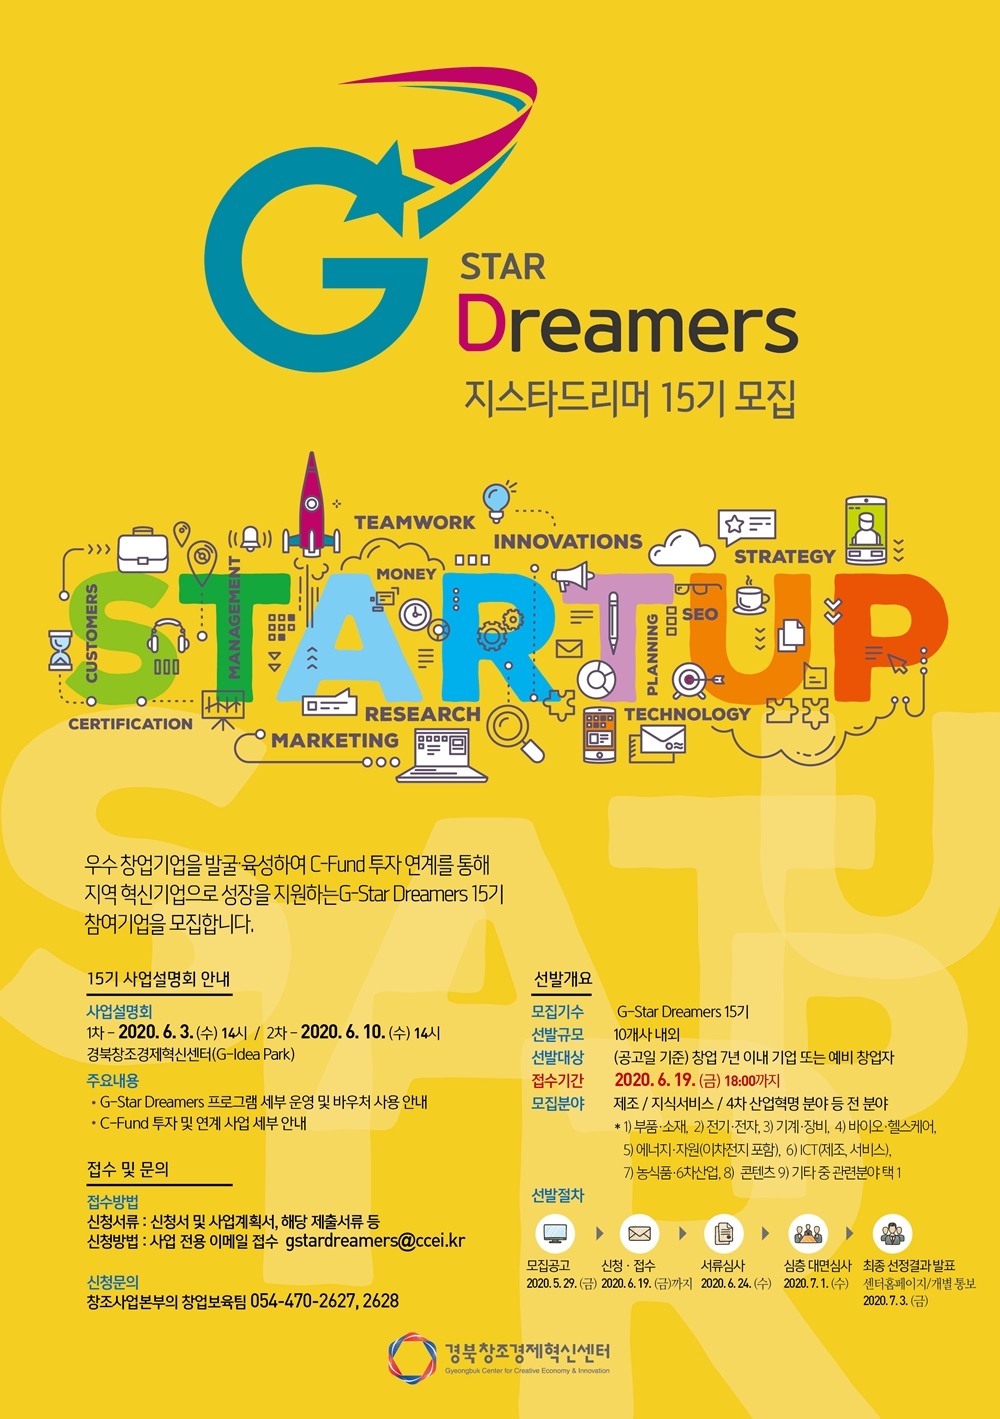 Gstar Dreamers 지스타드리머 15기 모집 스타트업 우수창업기업을 ㅂ라굴 육성하며 C-Fund 투자 연계를 통해 지역 혁신기업으로 성장을 지원하는 G-Star Dreamers 15기 참여기업을 모집합니다. 15기 사업설명회 안내 사업설명회 1차 2020.6.3(수) 14시 / 2차 2020.6.10 (수) 14시 경북창조경제혁신센터(G-idea park) 주요 내용 G-star Dreamers 프로그램 세부 운영 및 바우쳐 사용 안내 C-Fund 투자 및 연계 사업 세부 안내 접수 및 문의 접수방법 신청서류: 신청서 및 사업계획서, 해당 제출서류 등 신청방법: 사업 전용 이메일 접수: gstardreamers@ccei.kr 신청문의 창조사업본부의 창업보육팀 054-470-2527, 2628 선발개요 모집기수 G-stars 15기 선발규모 10개사 내외 선발대상 (공고일 기준) 창업 7년 이내 기업 또는 예비 창업자 접수기간 2020.6.19(금) 18:00까지 모집분야 제조/지식서비스 / 4차 산업혁명 분야 등 전 분야 1)부품 소재 2) 전기 전자 3) 기게 장비 4) 바이오 헬스케어 5)에너지 자원(이차전지 포함) 6)ICT(제조, 서비스) 7)농식품 5차산업 8)콘텐츠 9)기타 중 관련분야 택 1 선발절차 모집공고 2020.5.29(금) 신청 접수 2020.6.19(금)까지 서류심사 2020.6.26(수) 심층 대면심사 2020.7.1(수) 최종 선정결과 발표 센터홈페이지/개별통보 2020.7.3(금) 경북창조경제혁신센터